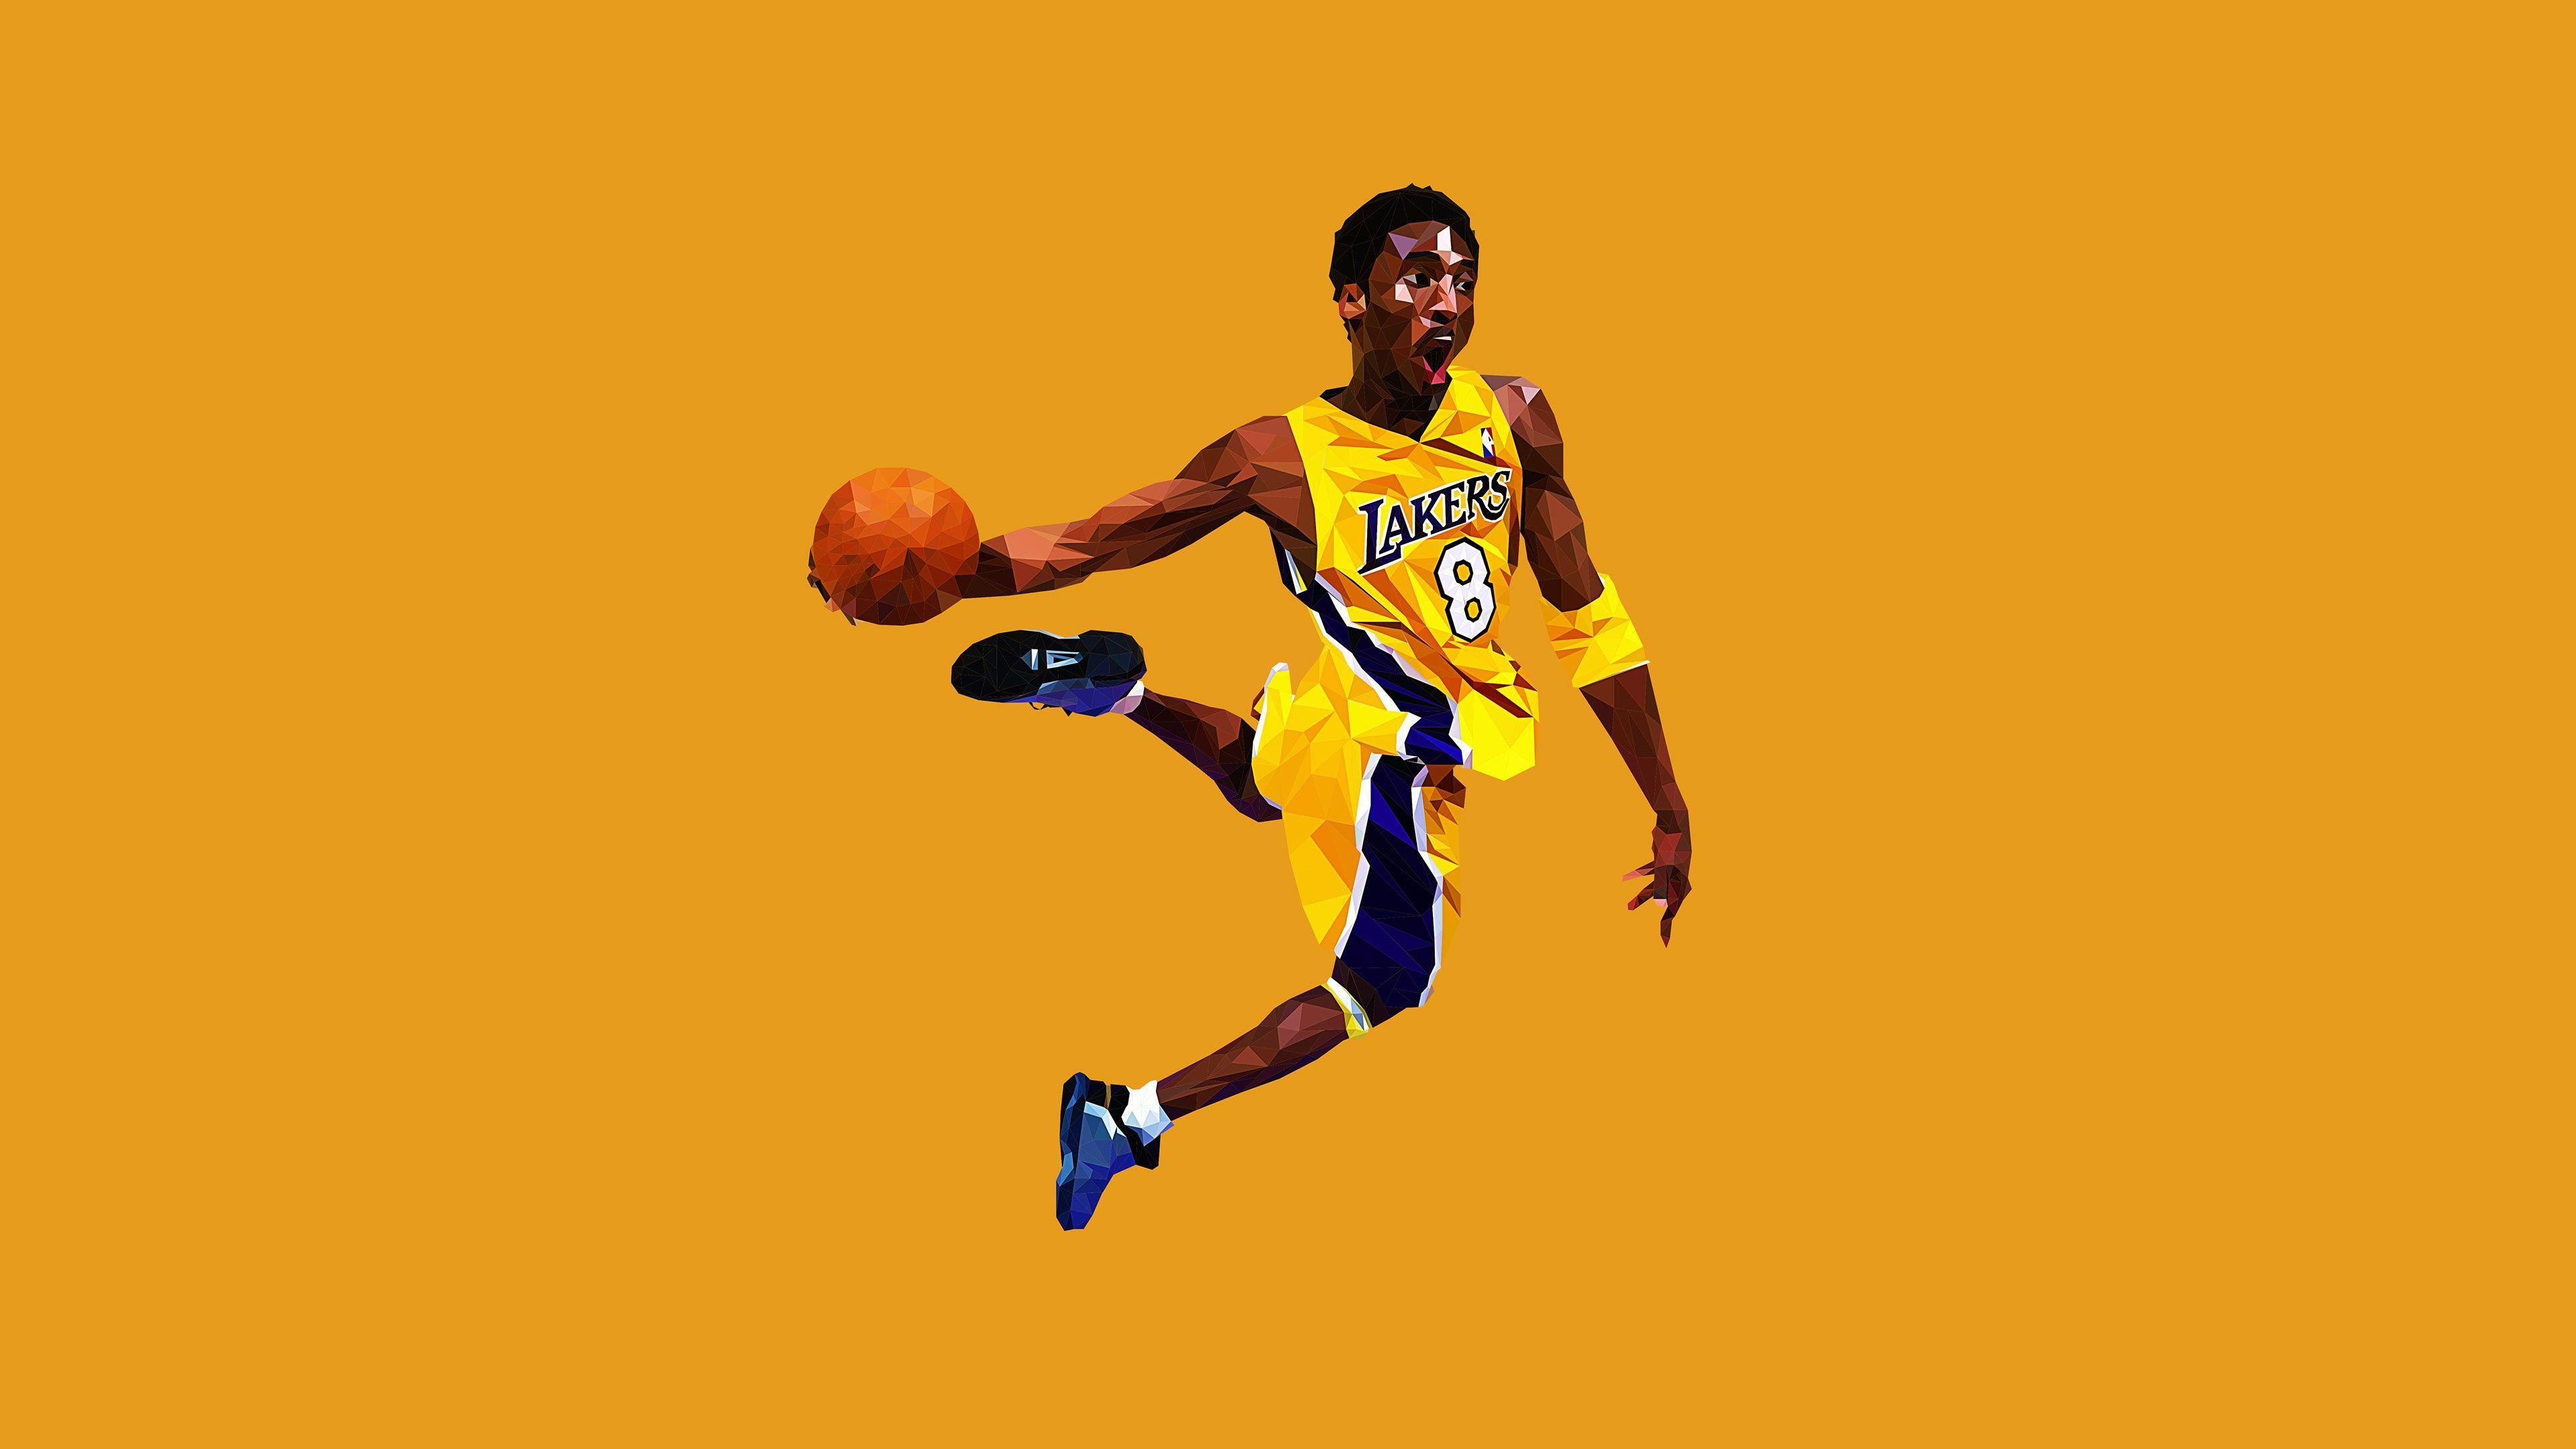 Kobe Cartoon Wallpapers - Top Free Kobe Cartoon ...